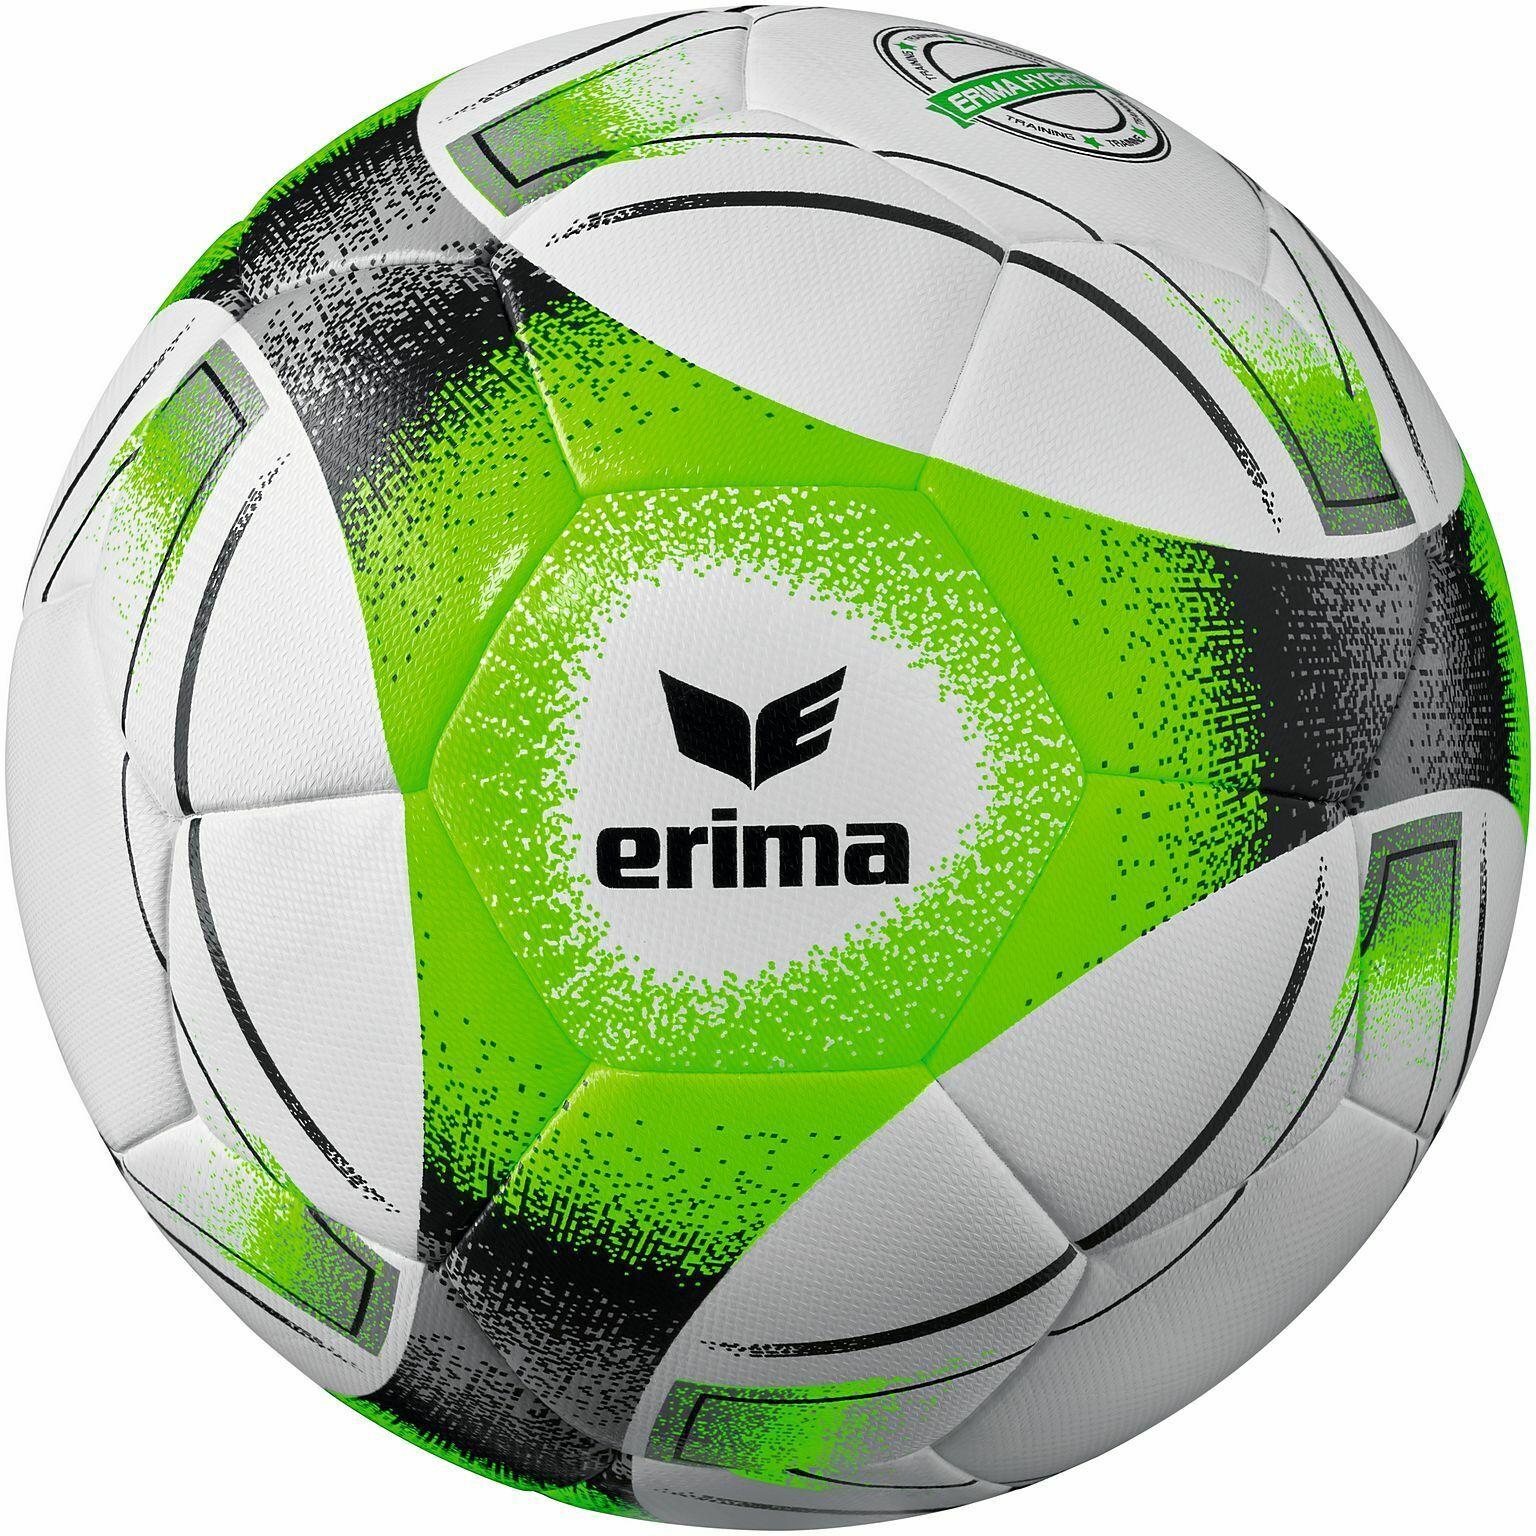 Erima 7191903 Hybrid Training Fußball Gr 5 Schwarz Grau Grün